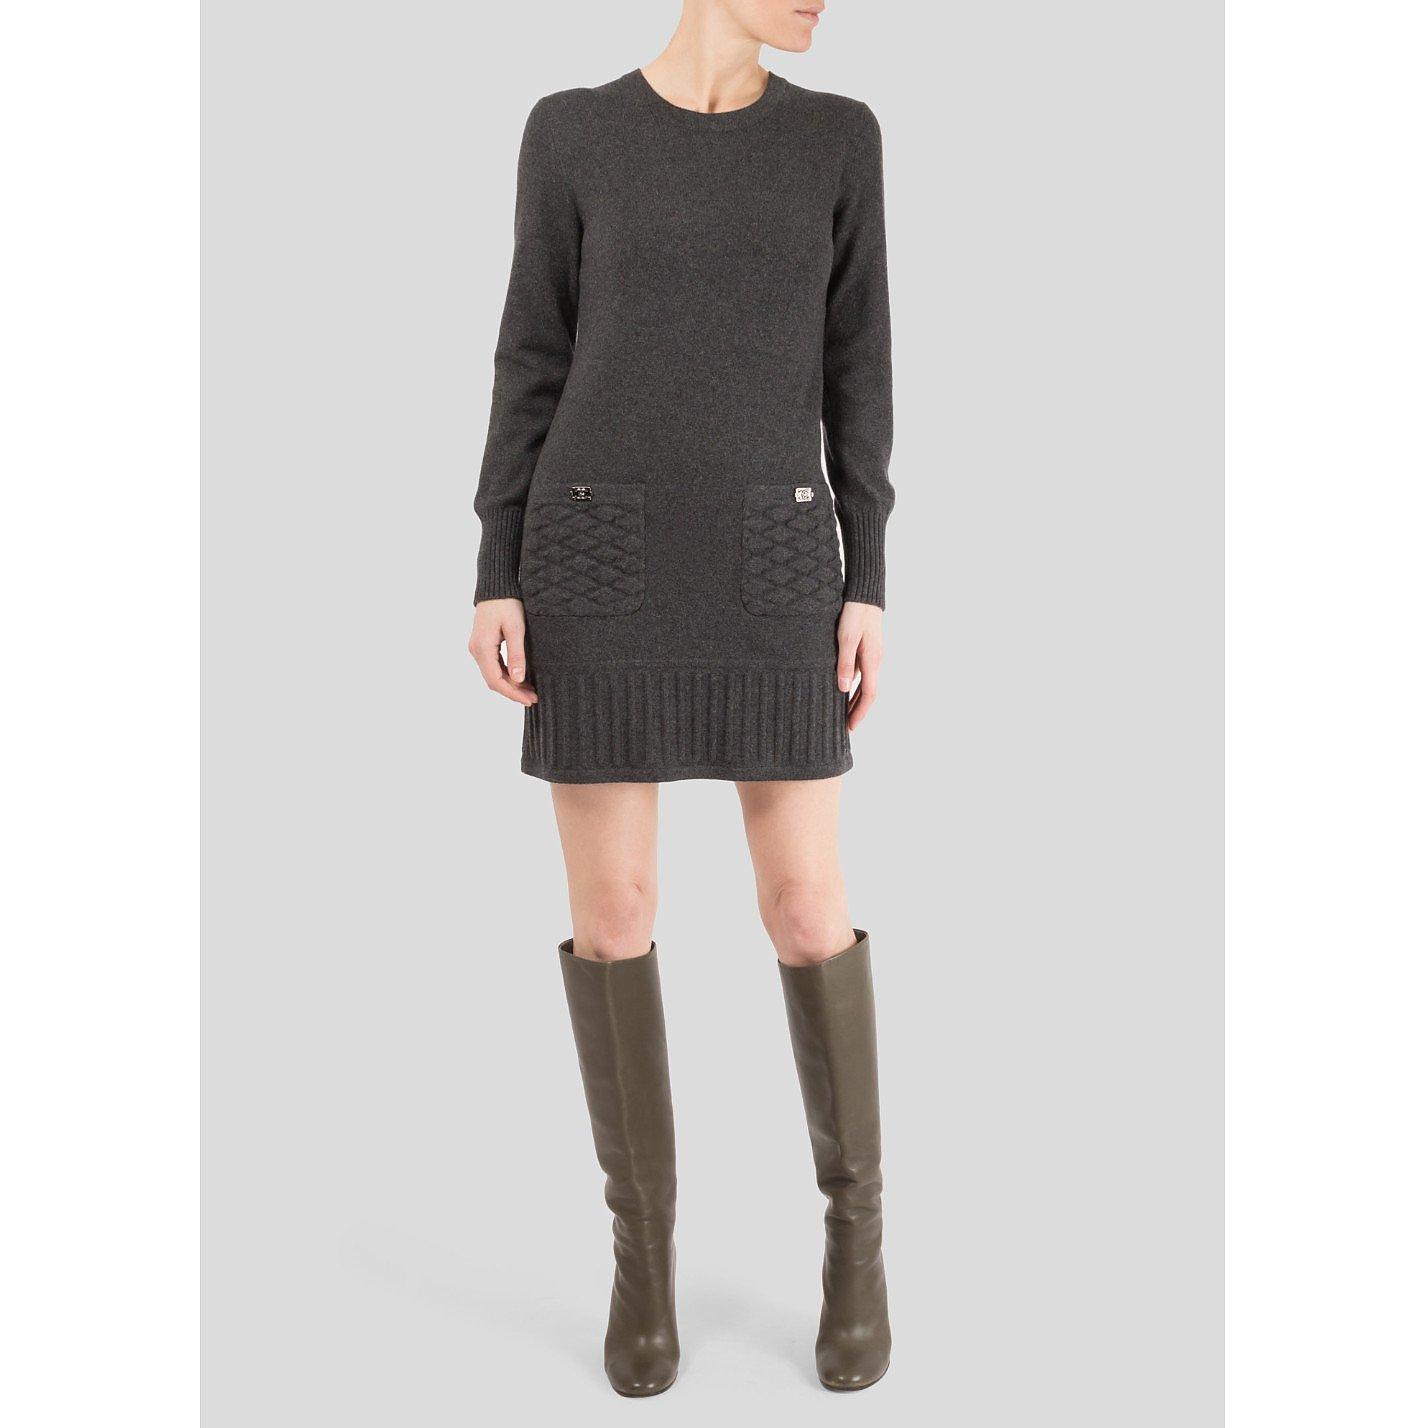 CHANEL Cashmere-Blend Mini Dress